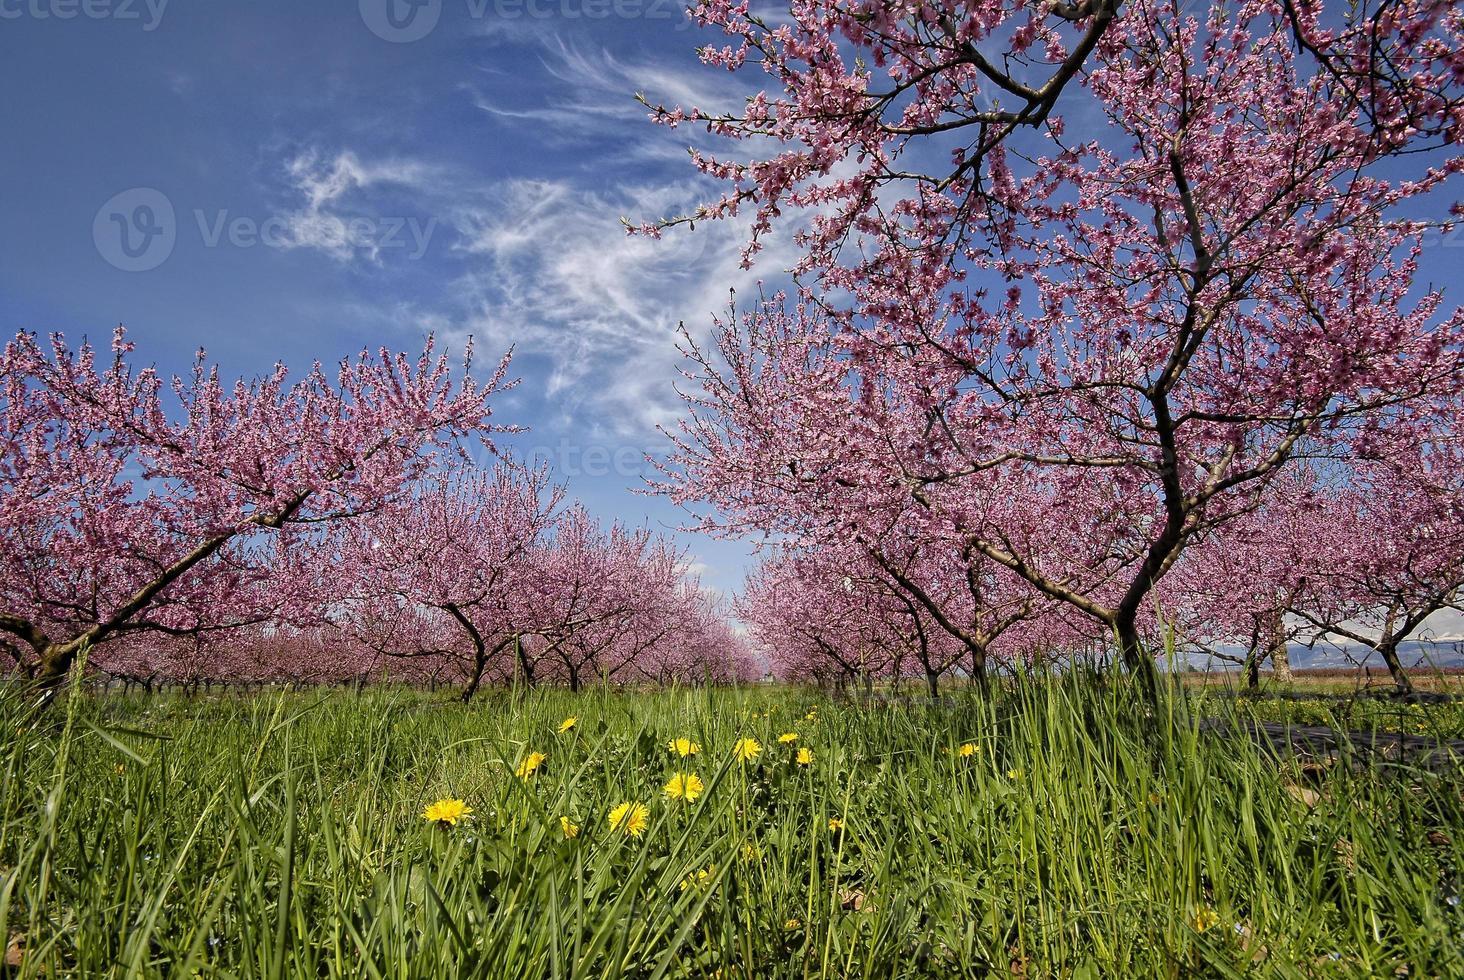 alberi di pesco in fiore. foto